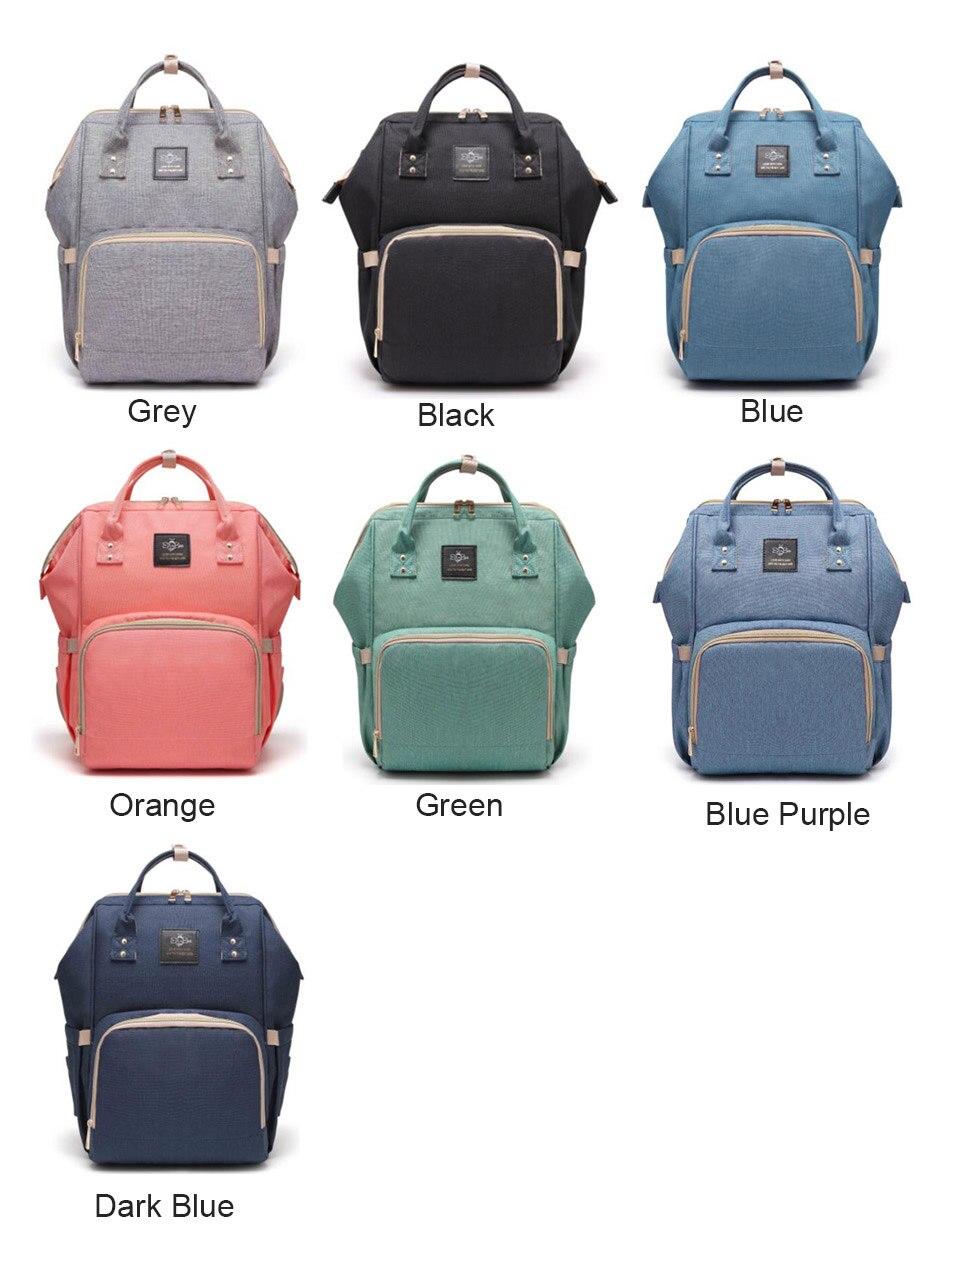 Купить с кэшбэком New Upgraded Diaper Bag Fashion Mummy Maternity Nappy Bag Large Capacity Baby Bag Travel Backpack Designer Nursing Bag Baby Care